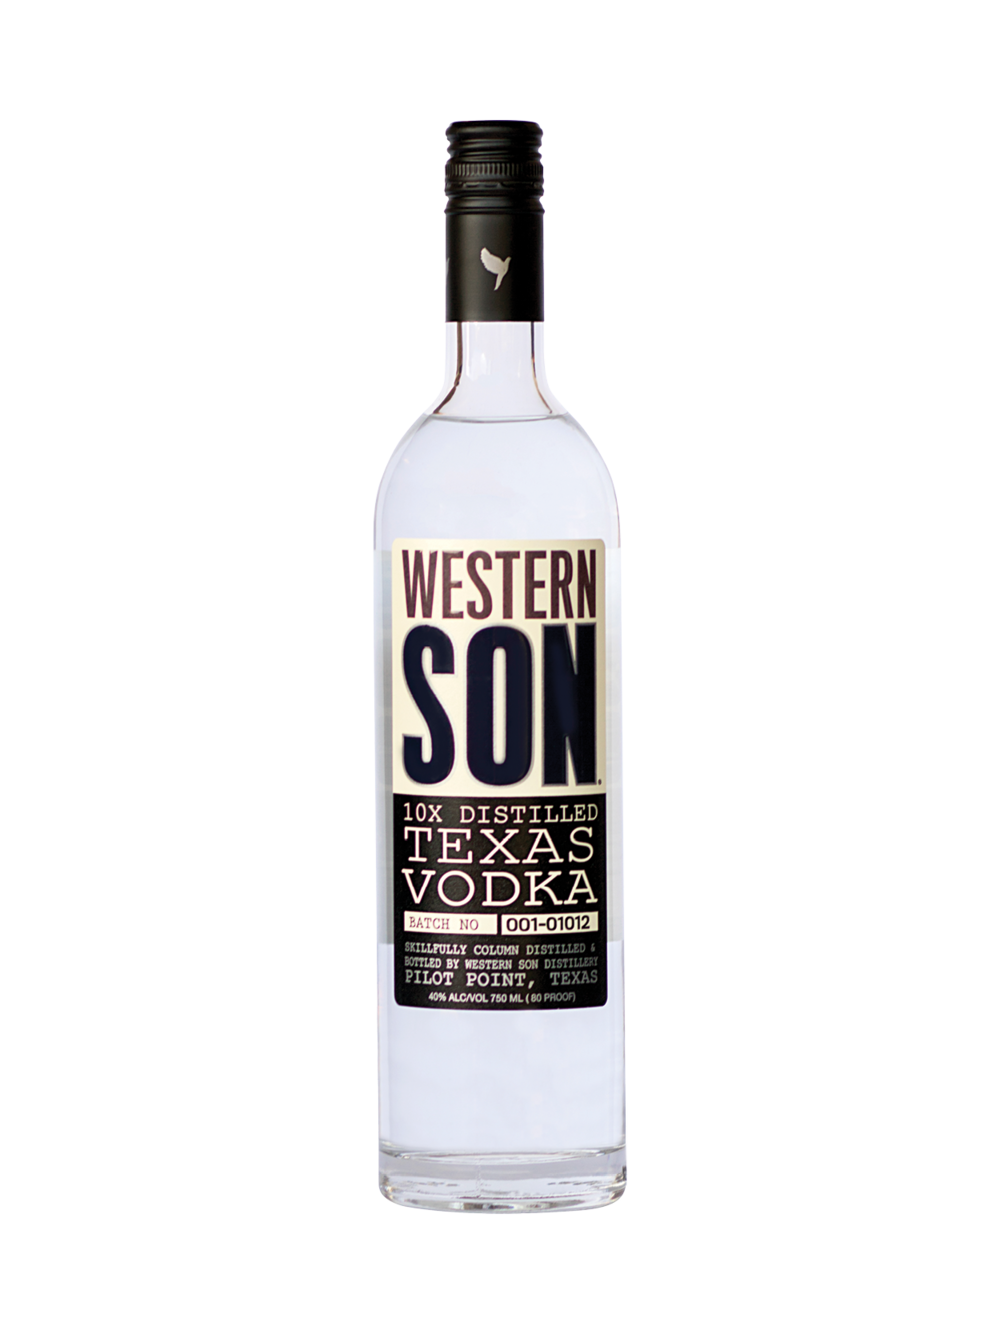 - Western Sunset1 1/2 parts Western Son Original Vodka1/2 part elderflower liqueur1 1/2 parts fresh lemonadeTop with club sodaGarnish w/ LimeWestern Mule1 part Western Son Original Vodka2 parts Western Son Ginger BeerSqueeze of lime